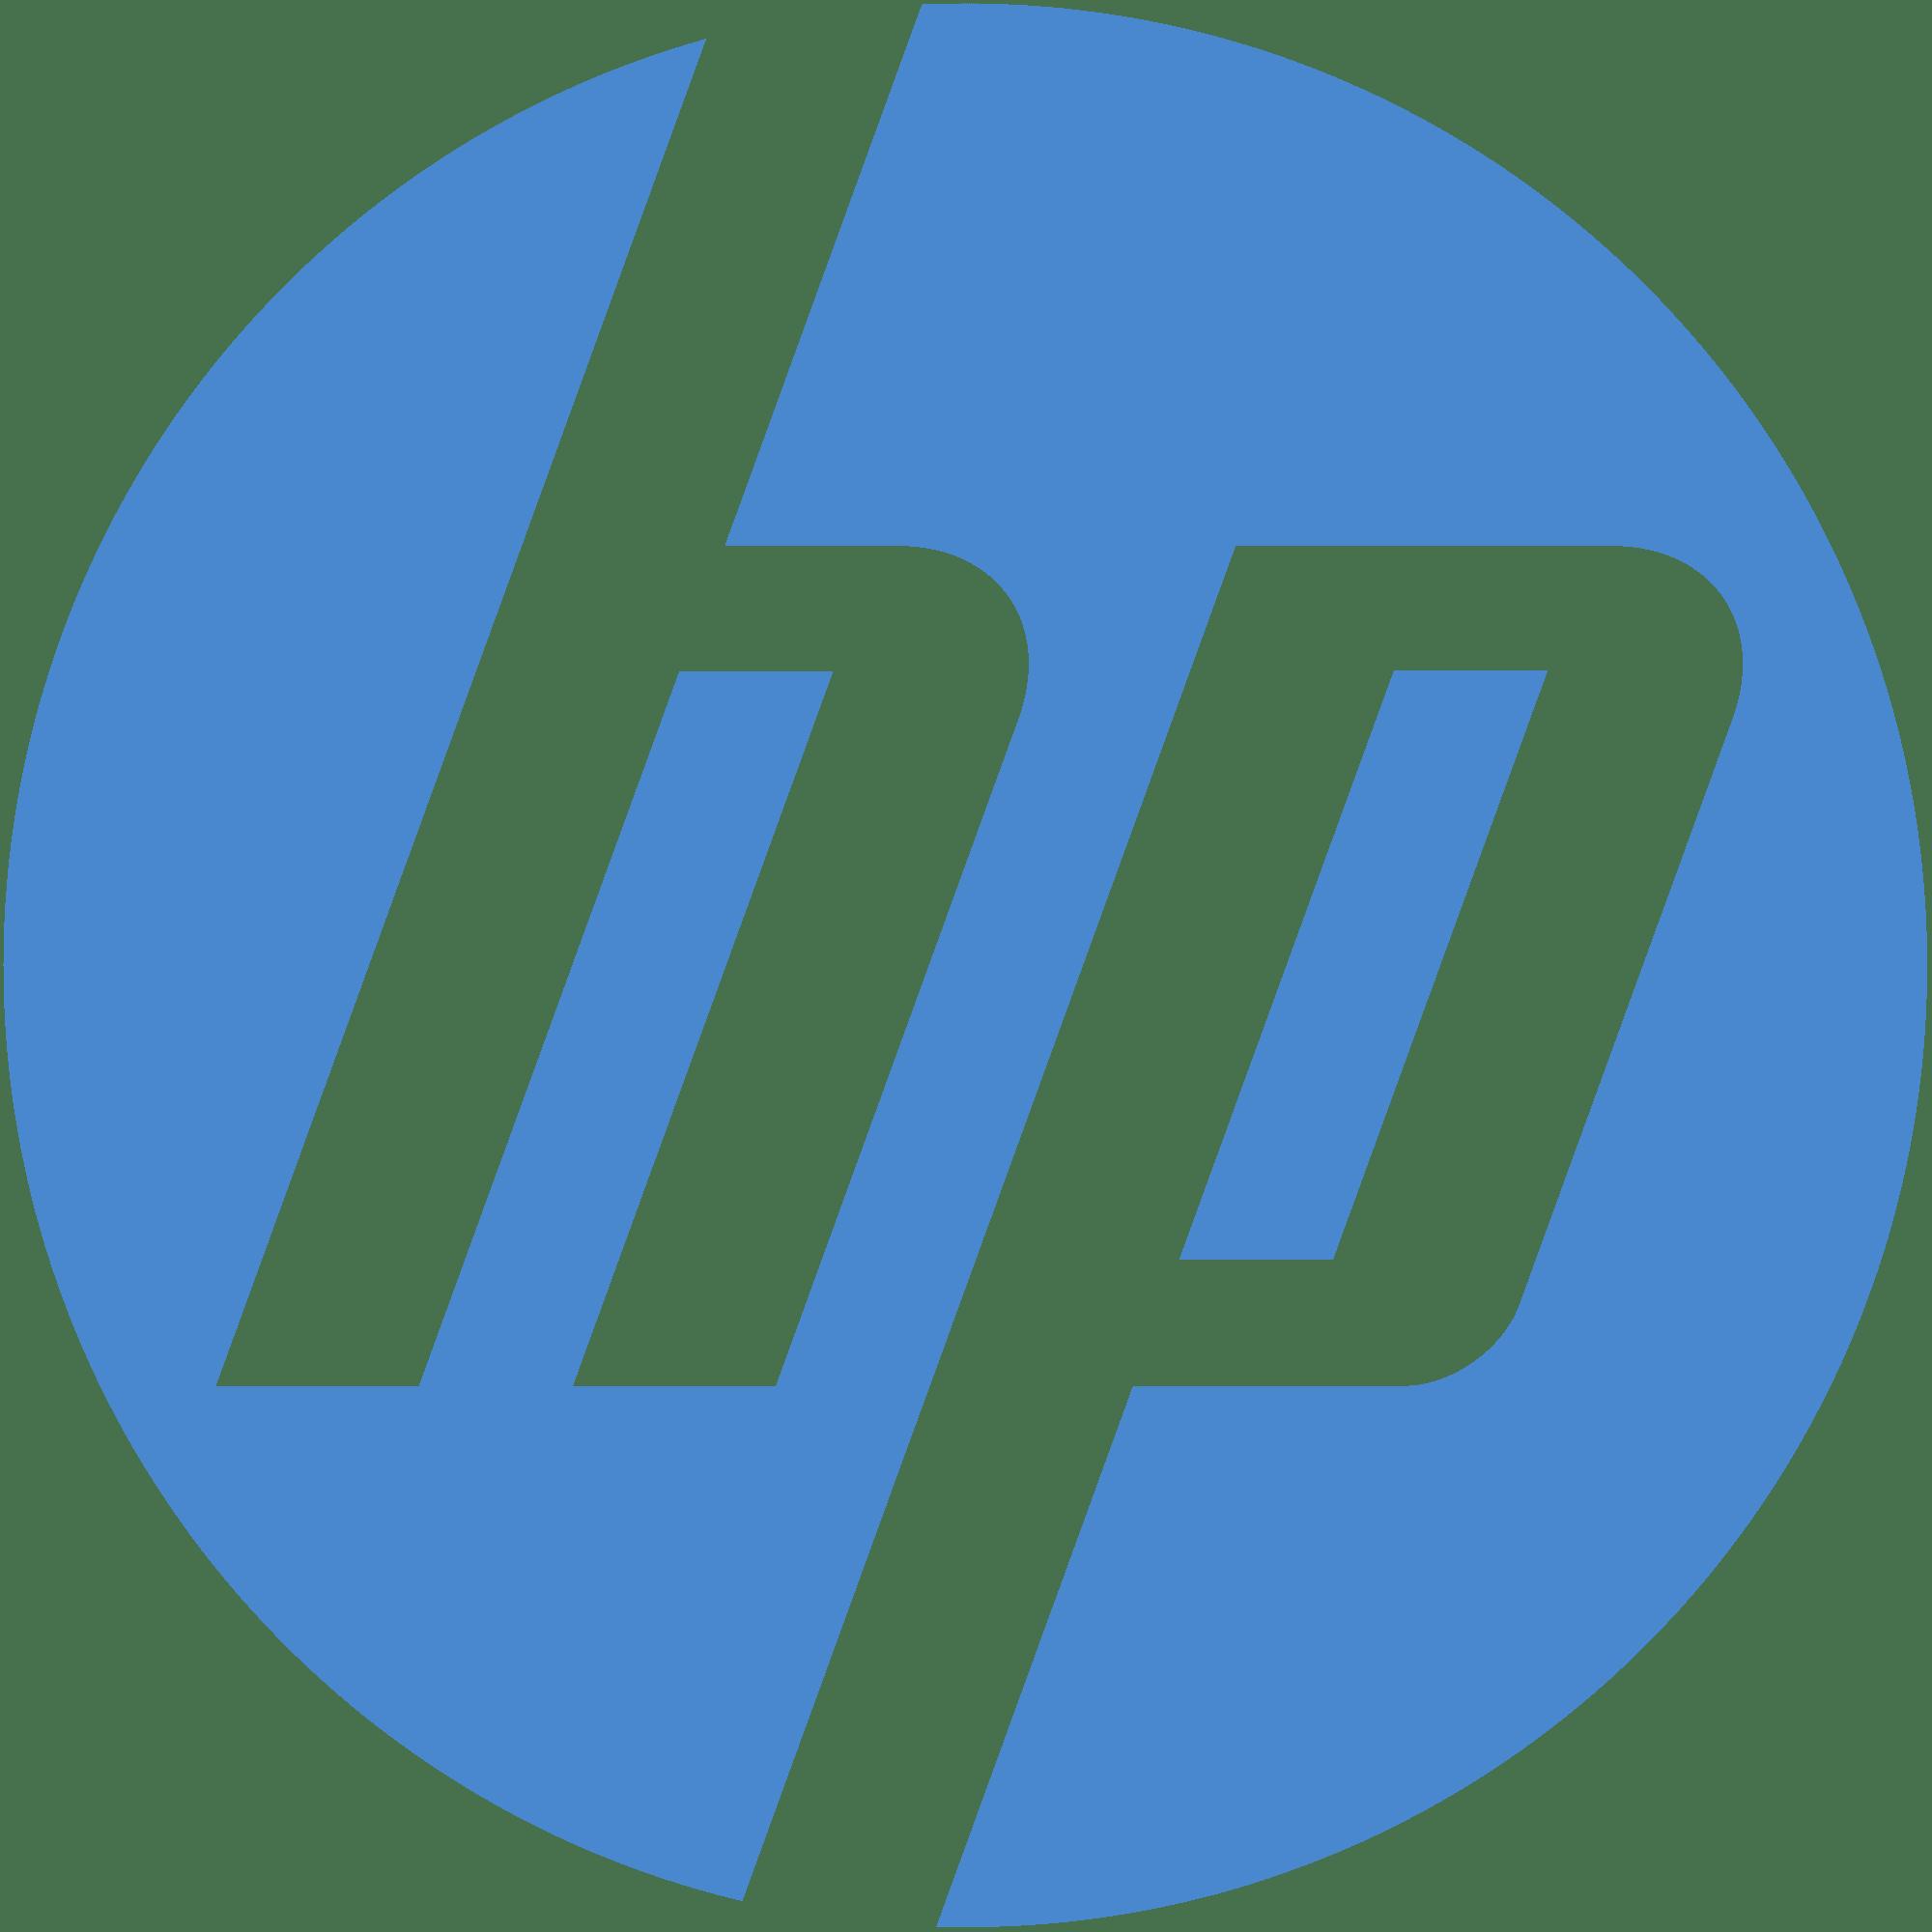 HP Pavilion 23xi 23-inch IPS LED Monitor drivers